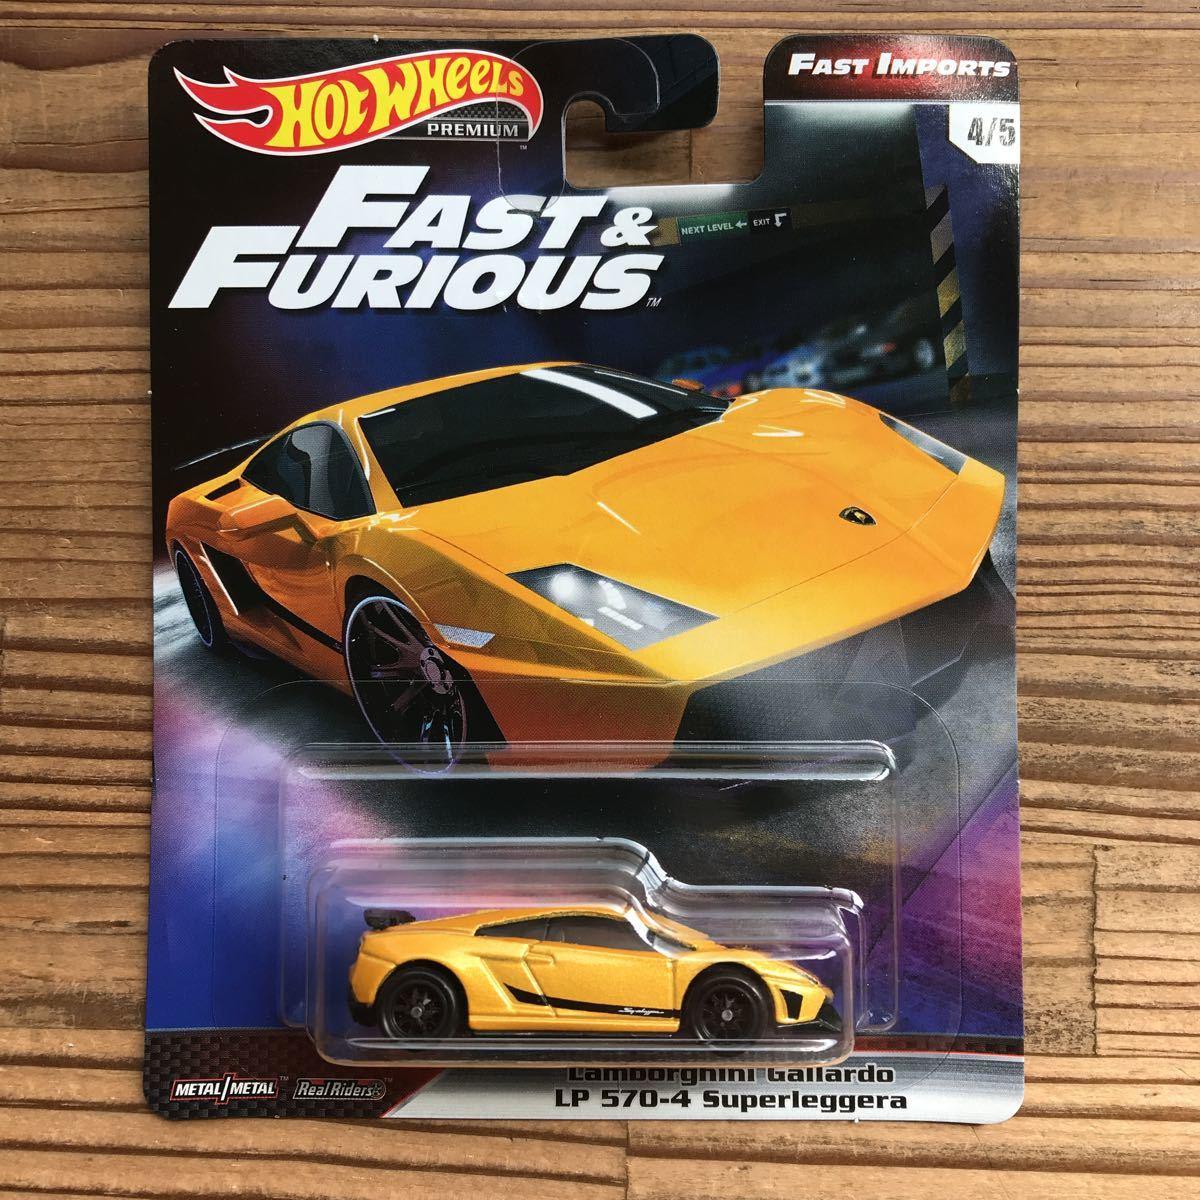 Hot Wheels Fast And Furious Premium Lamborghini Gallardo Lp 570 4